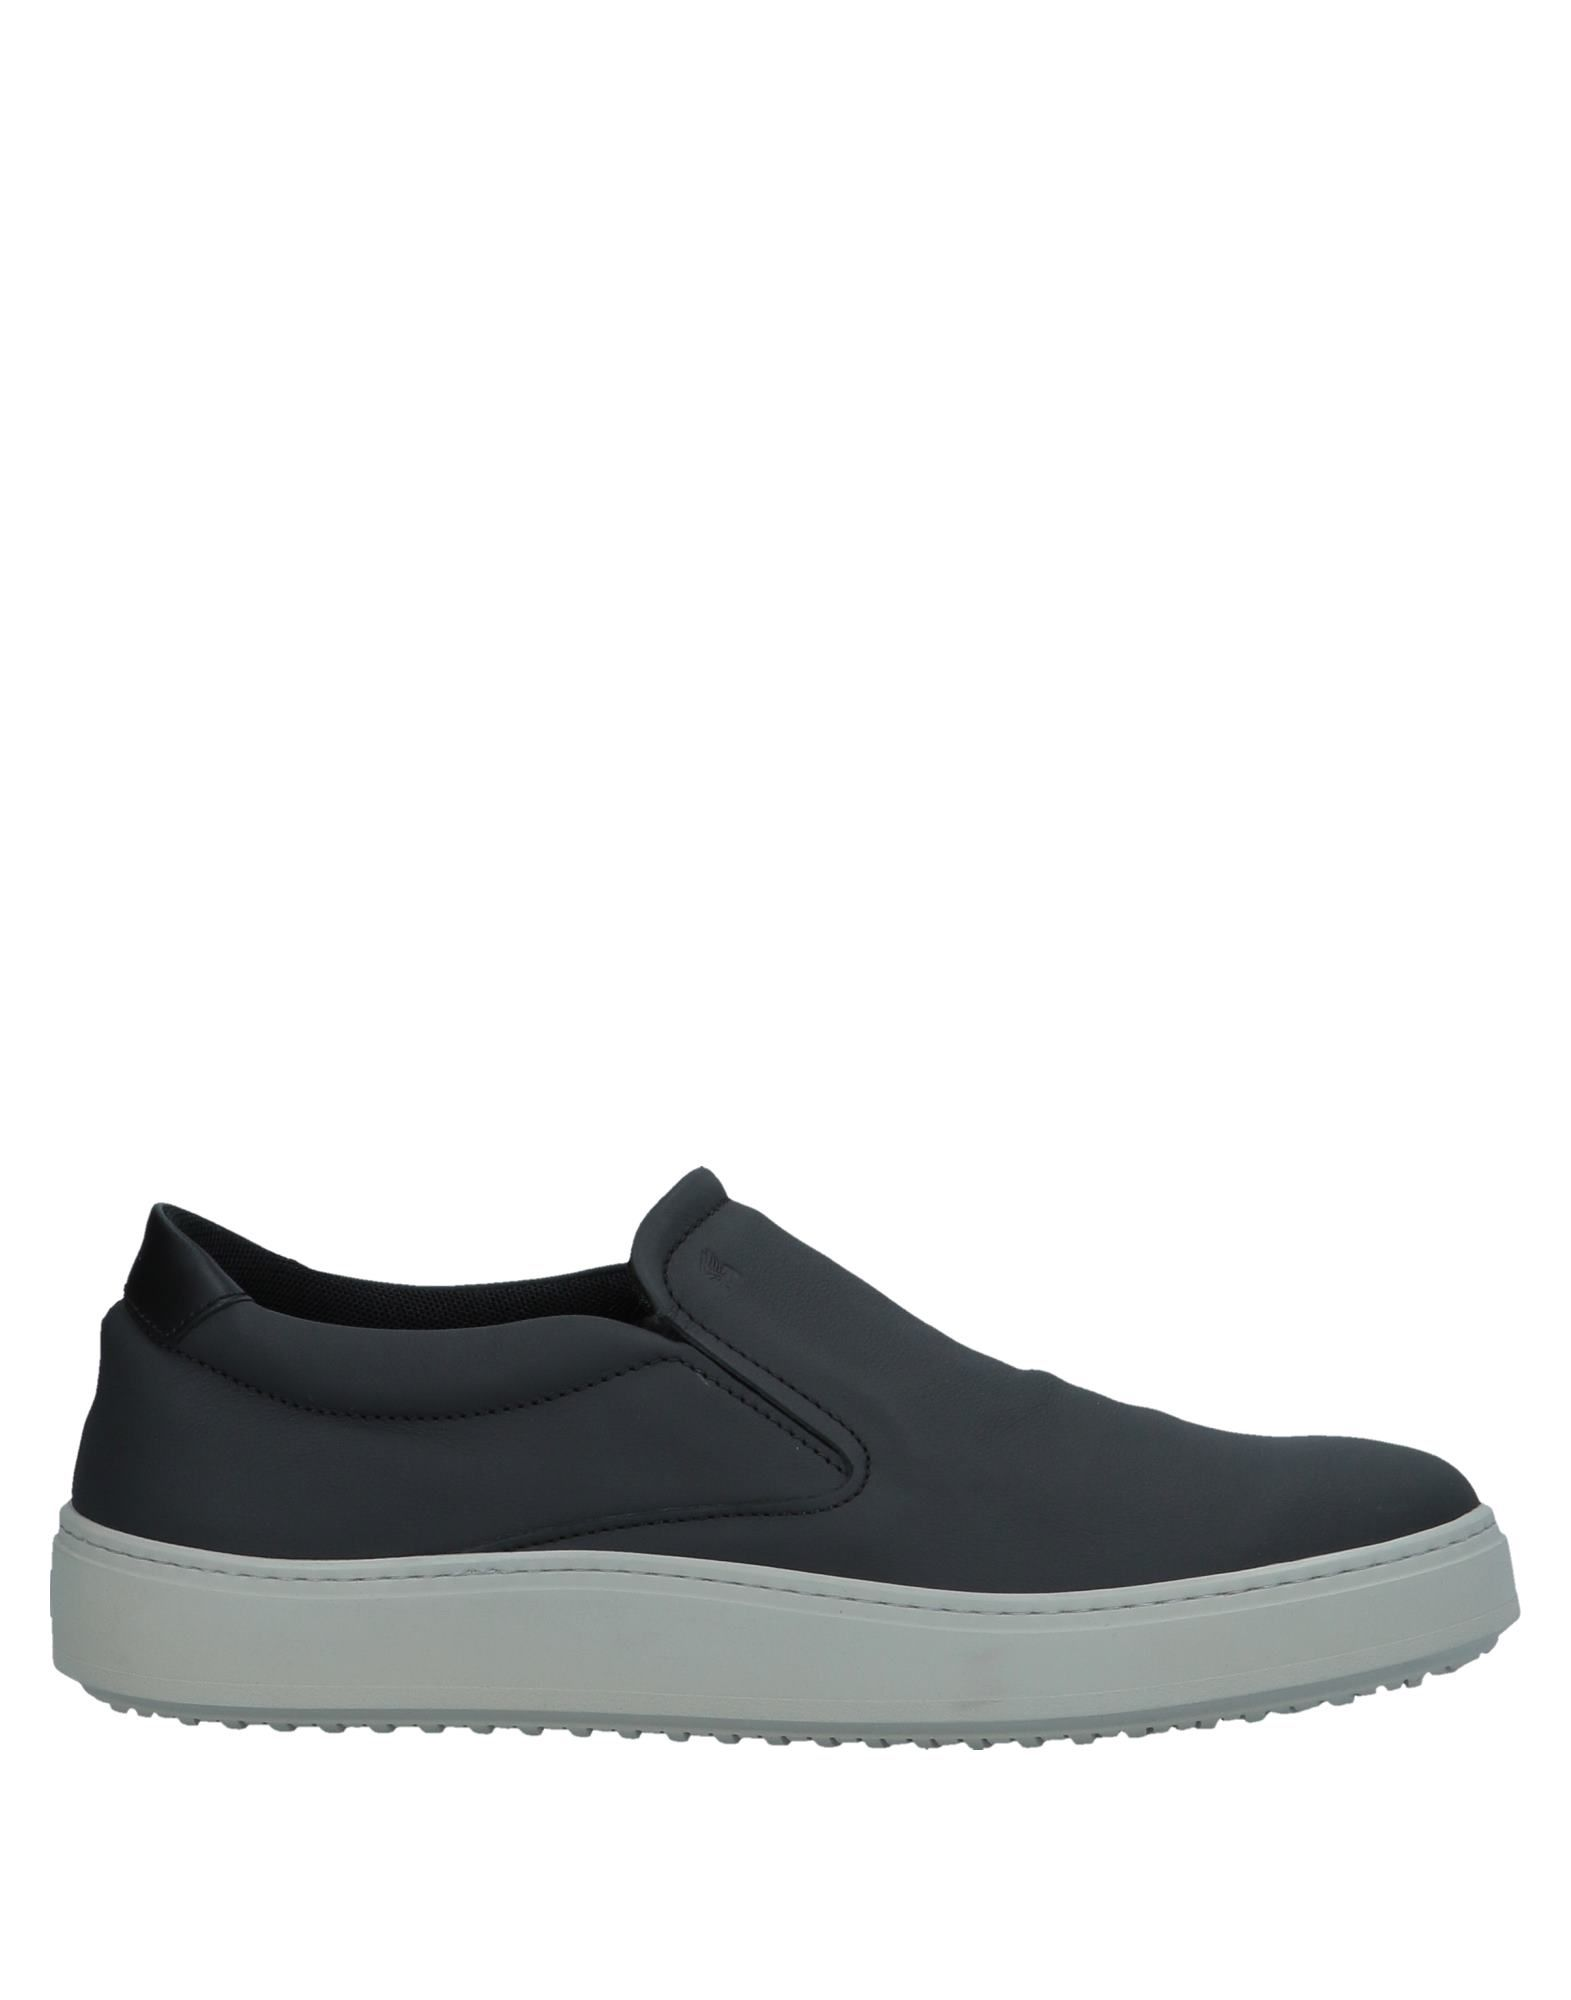 Hogan Sneakers Herren  11541384XB Gute Qualität beliebte Schuhe